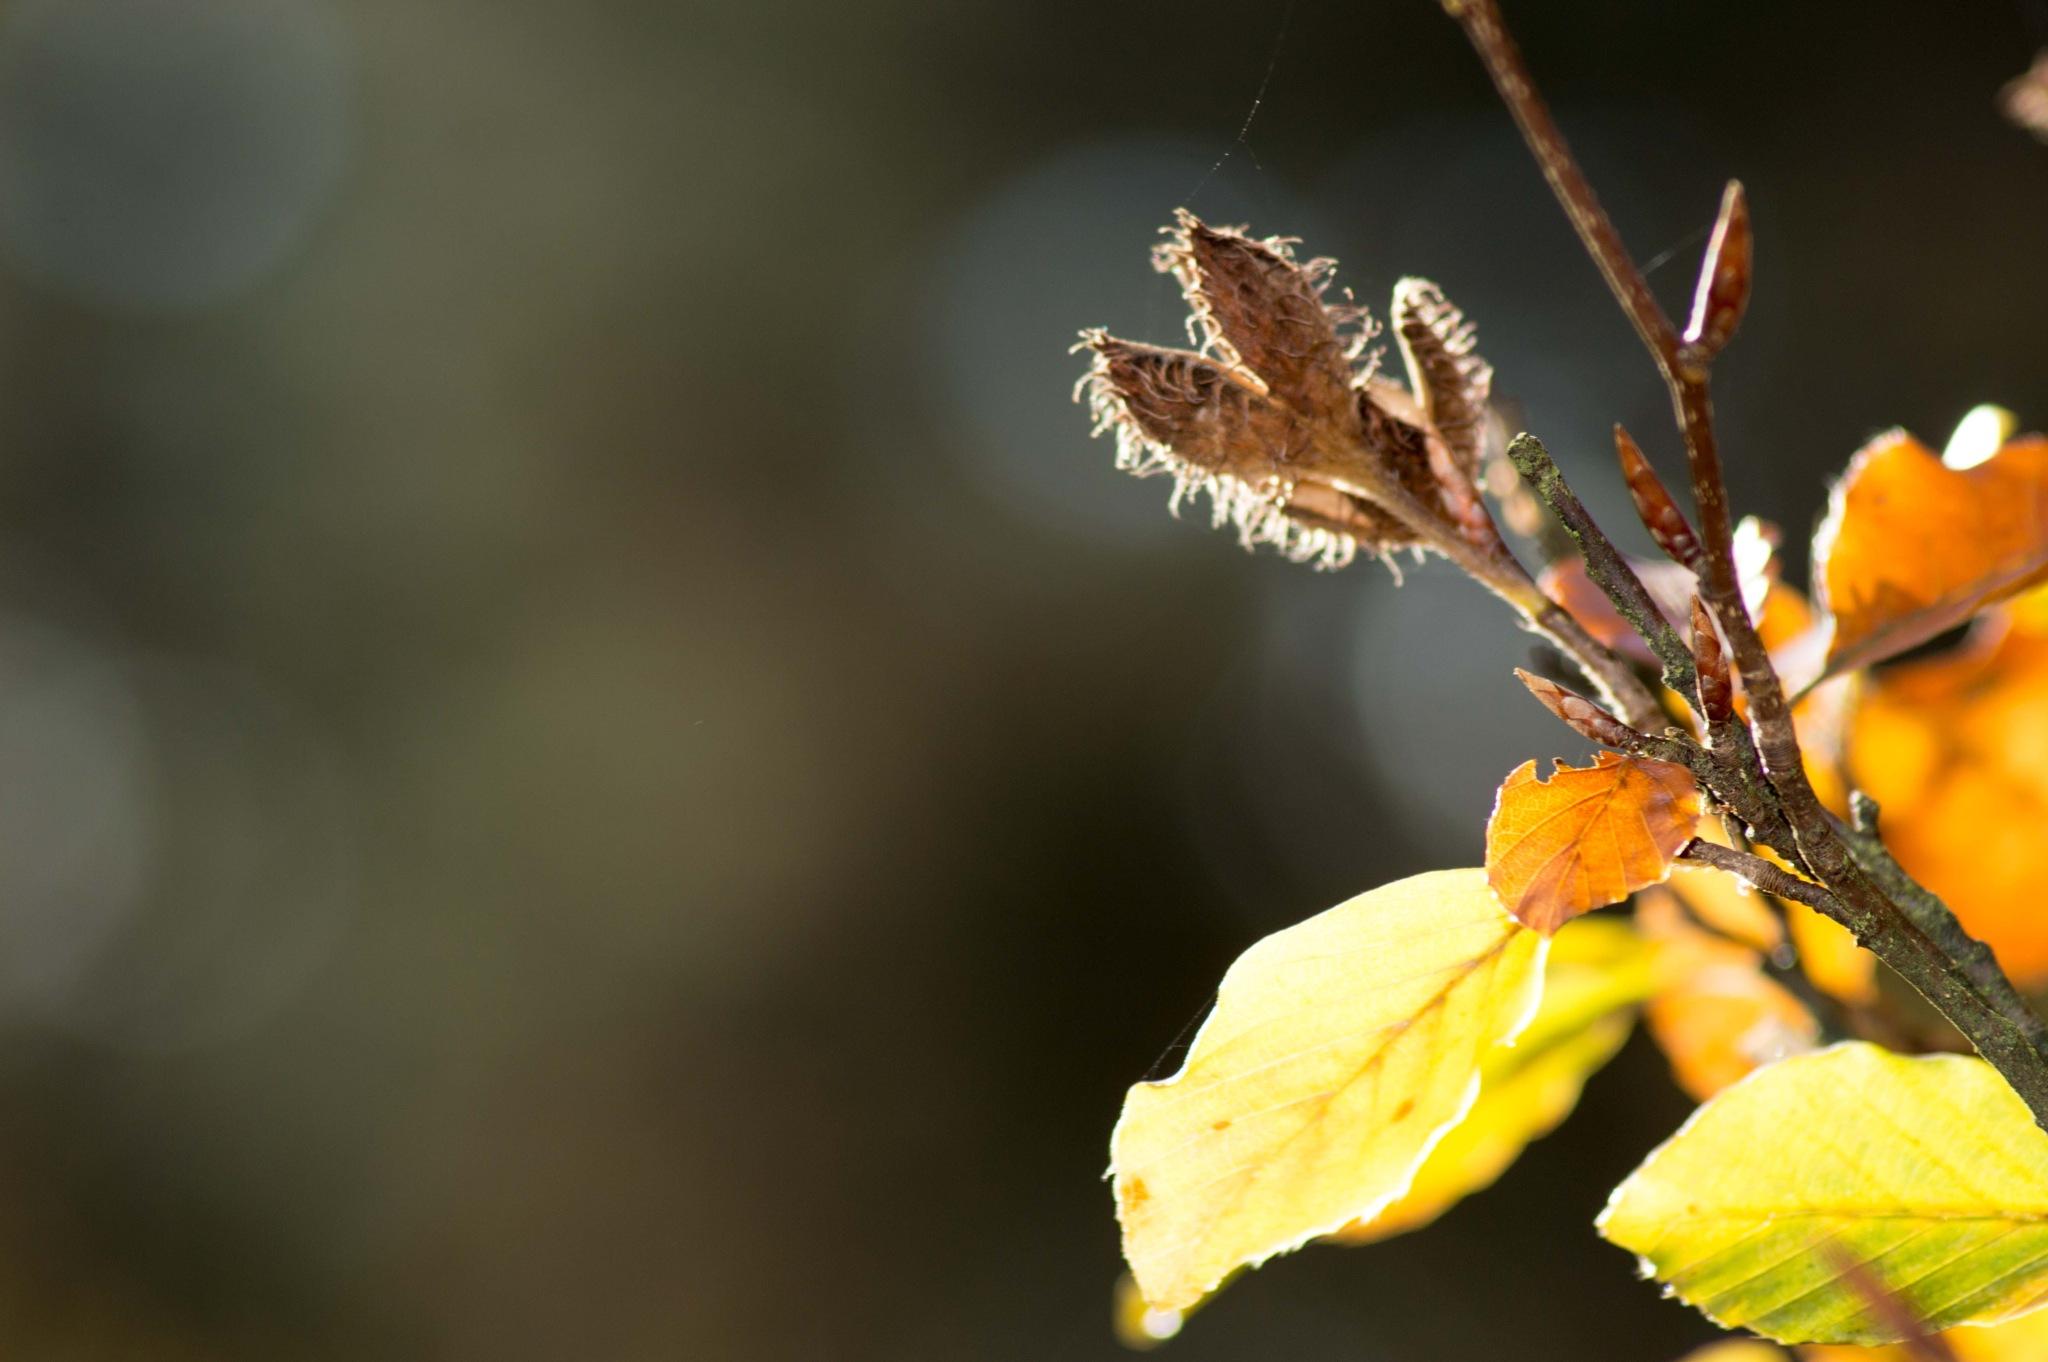 autumn leaf by missjoy86